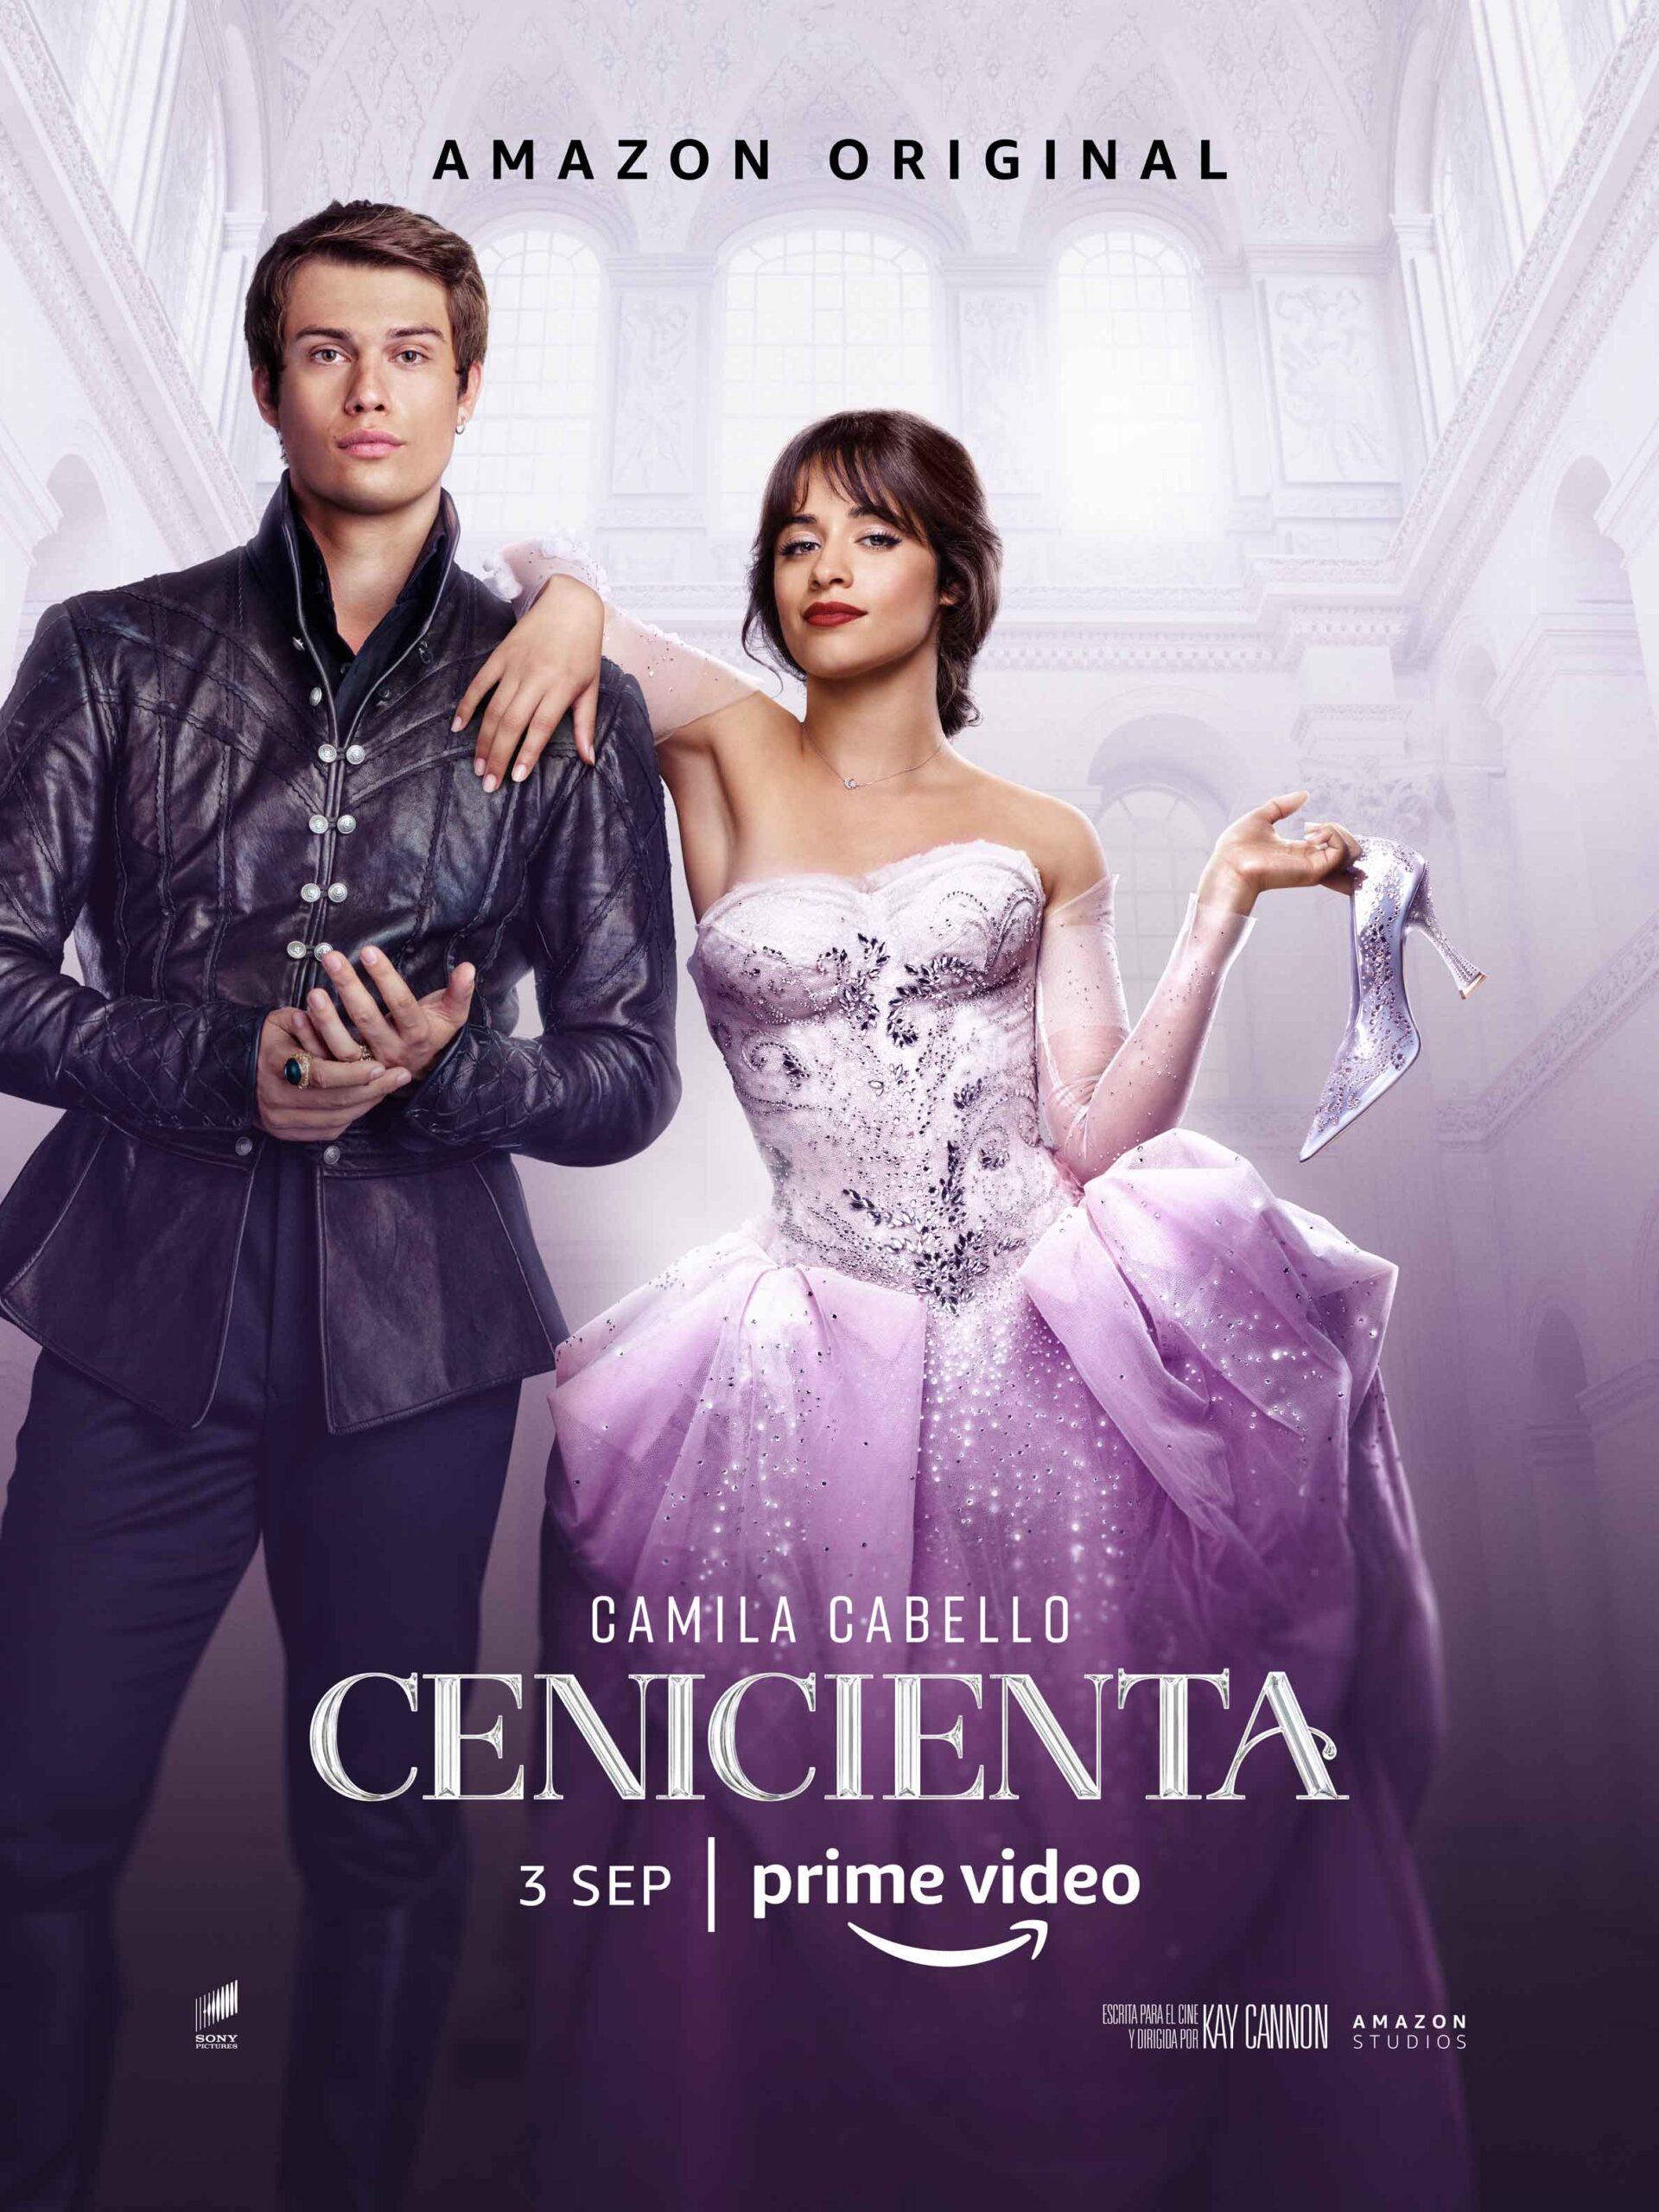 'Cenicienta': Tráiler de la adaptación con Camila Cabello • En tu pantalla